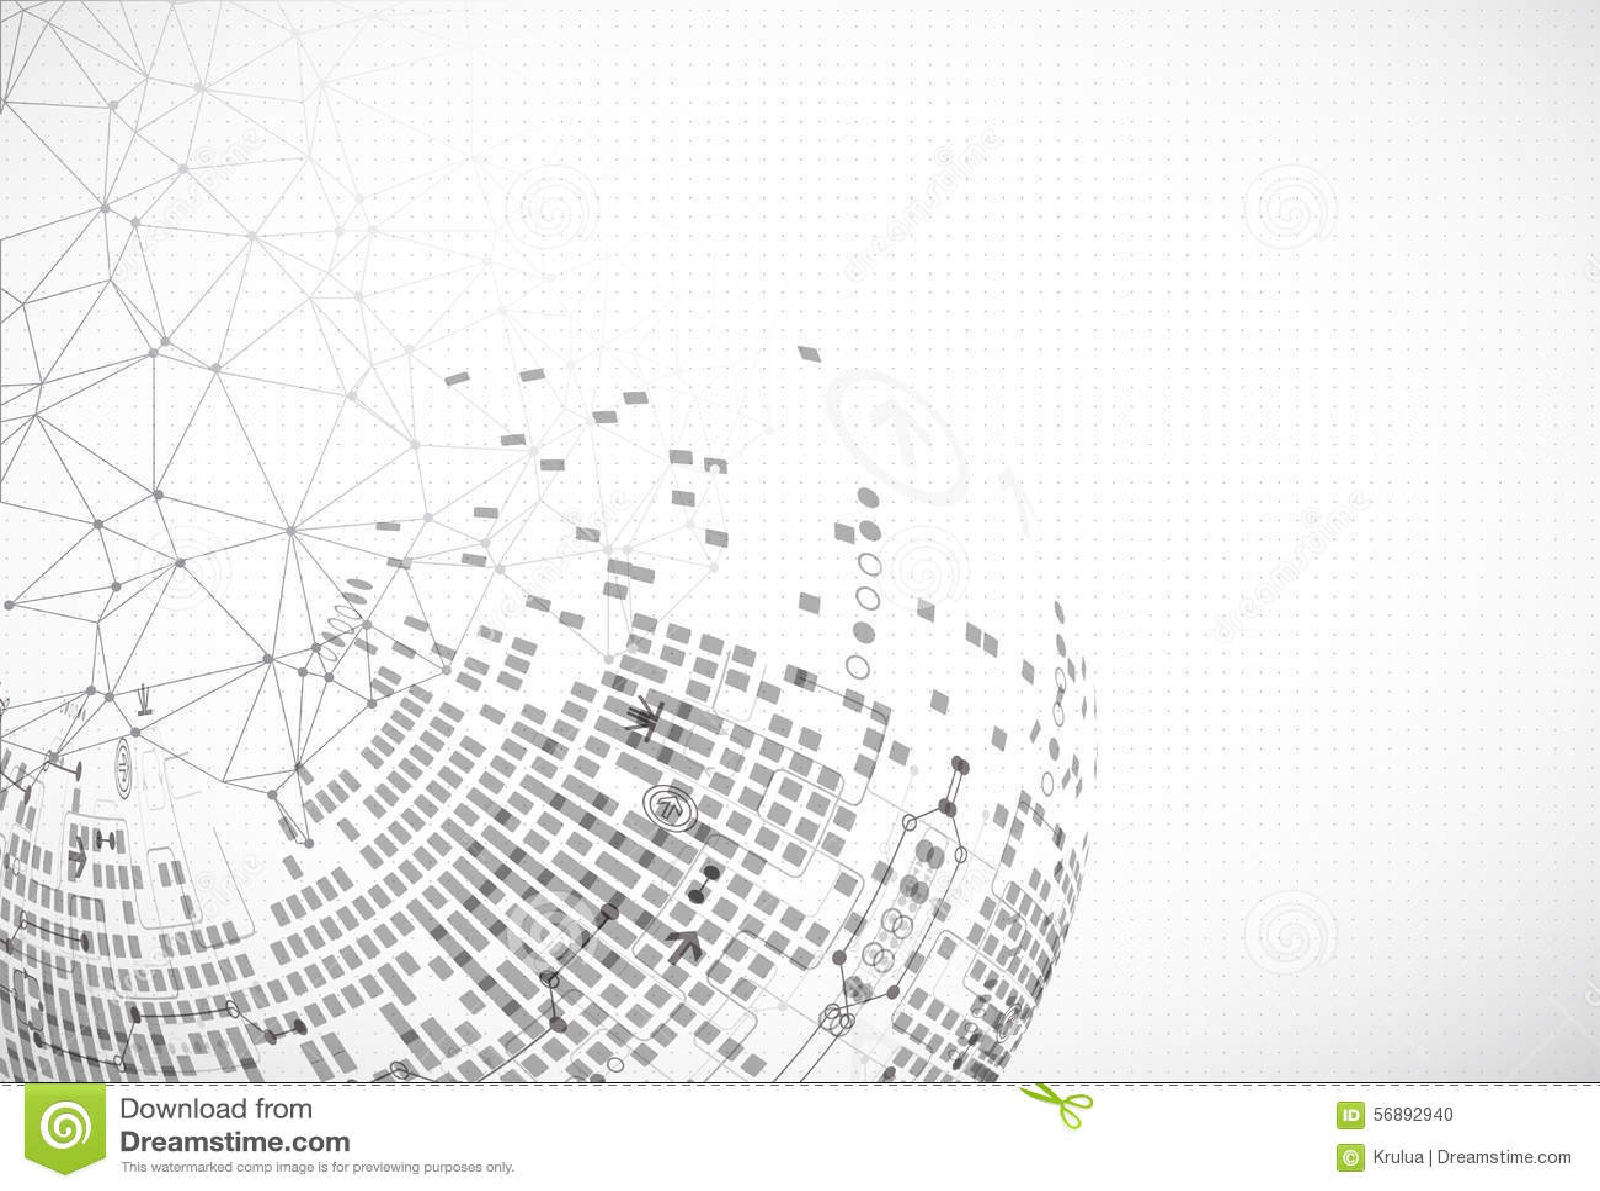 Abstract communication technology light design background.